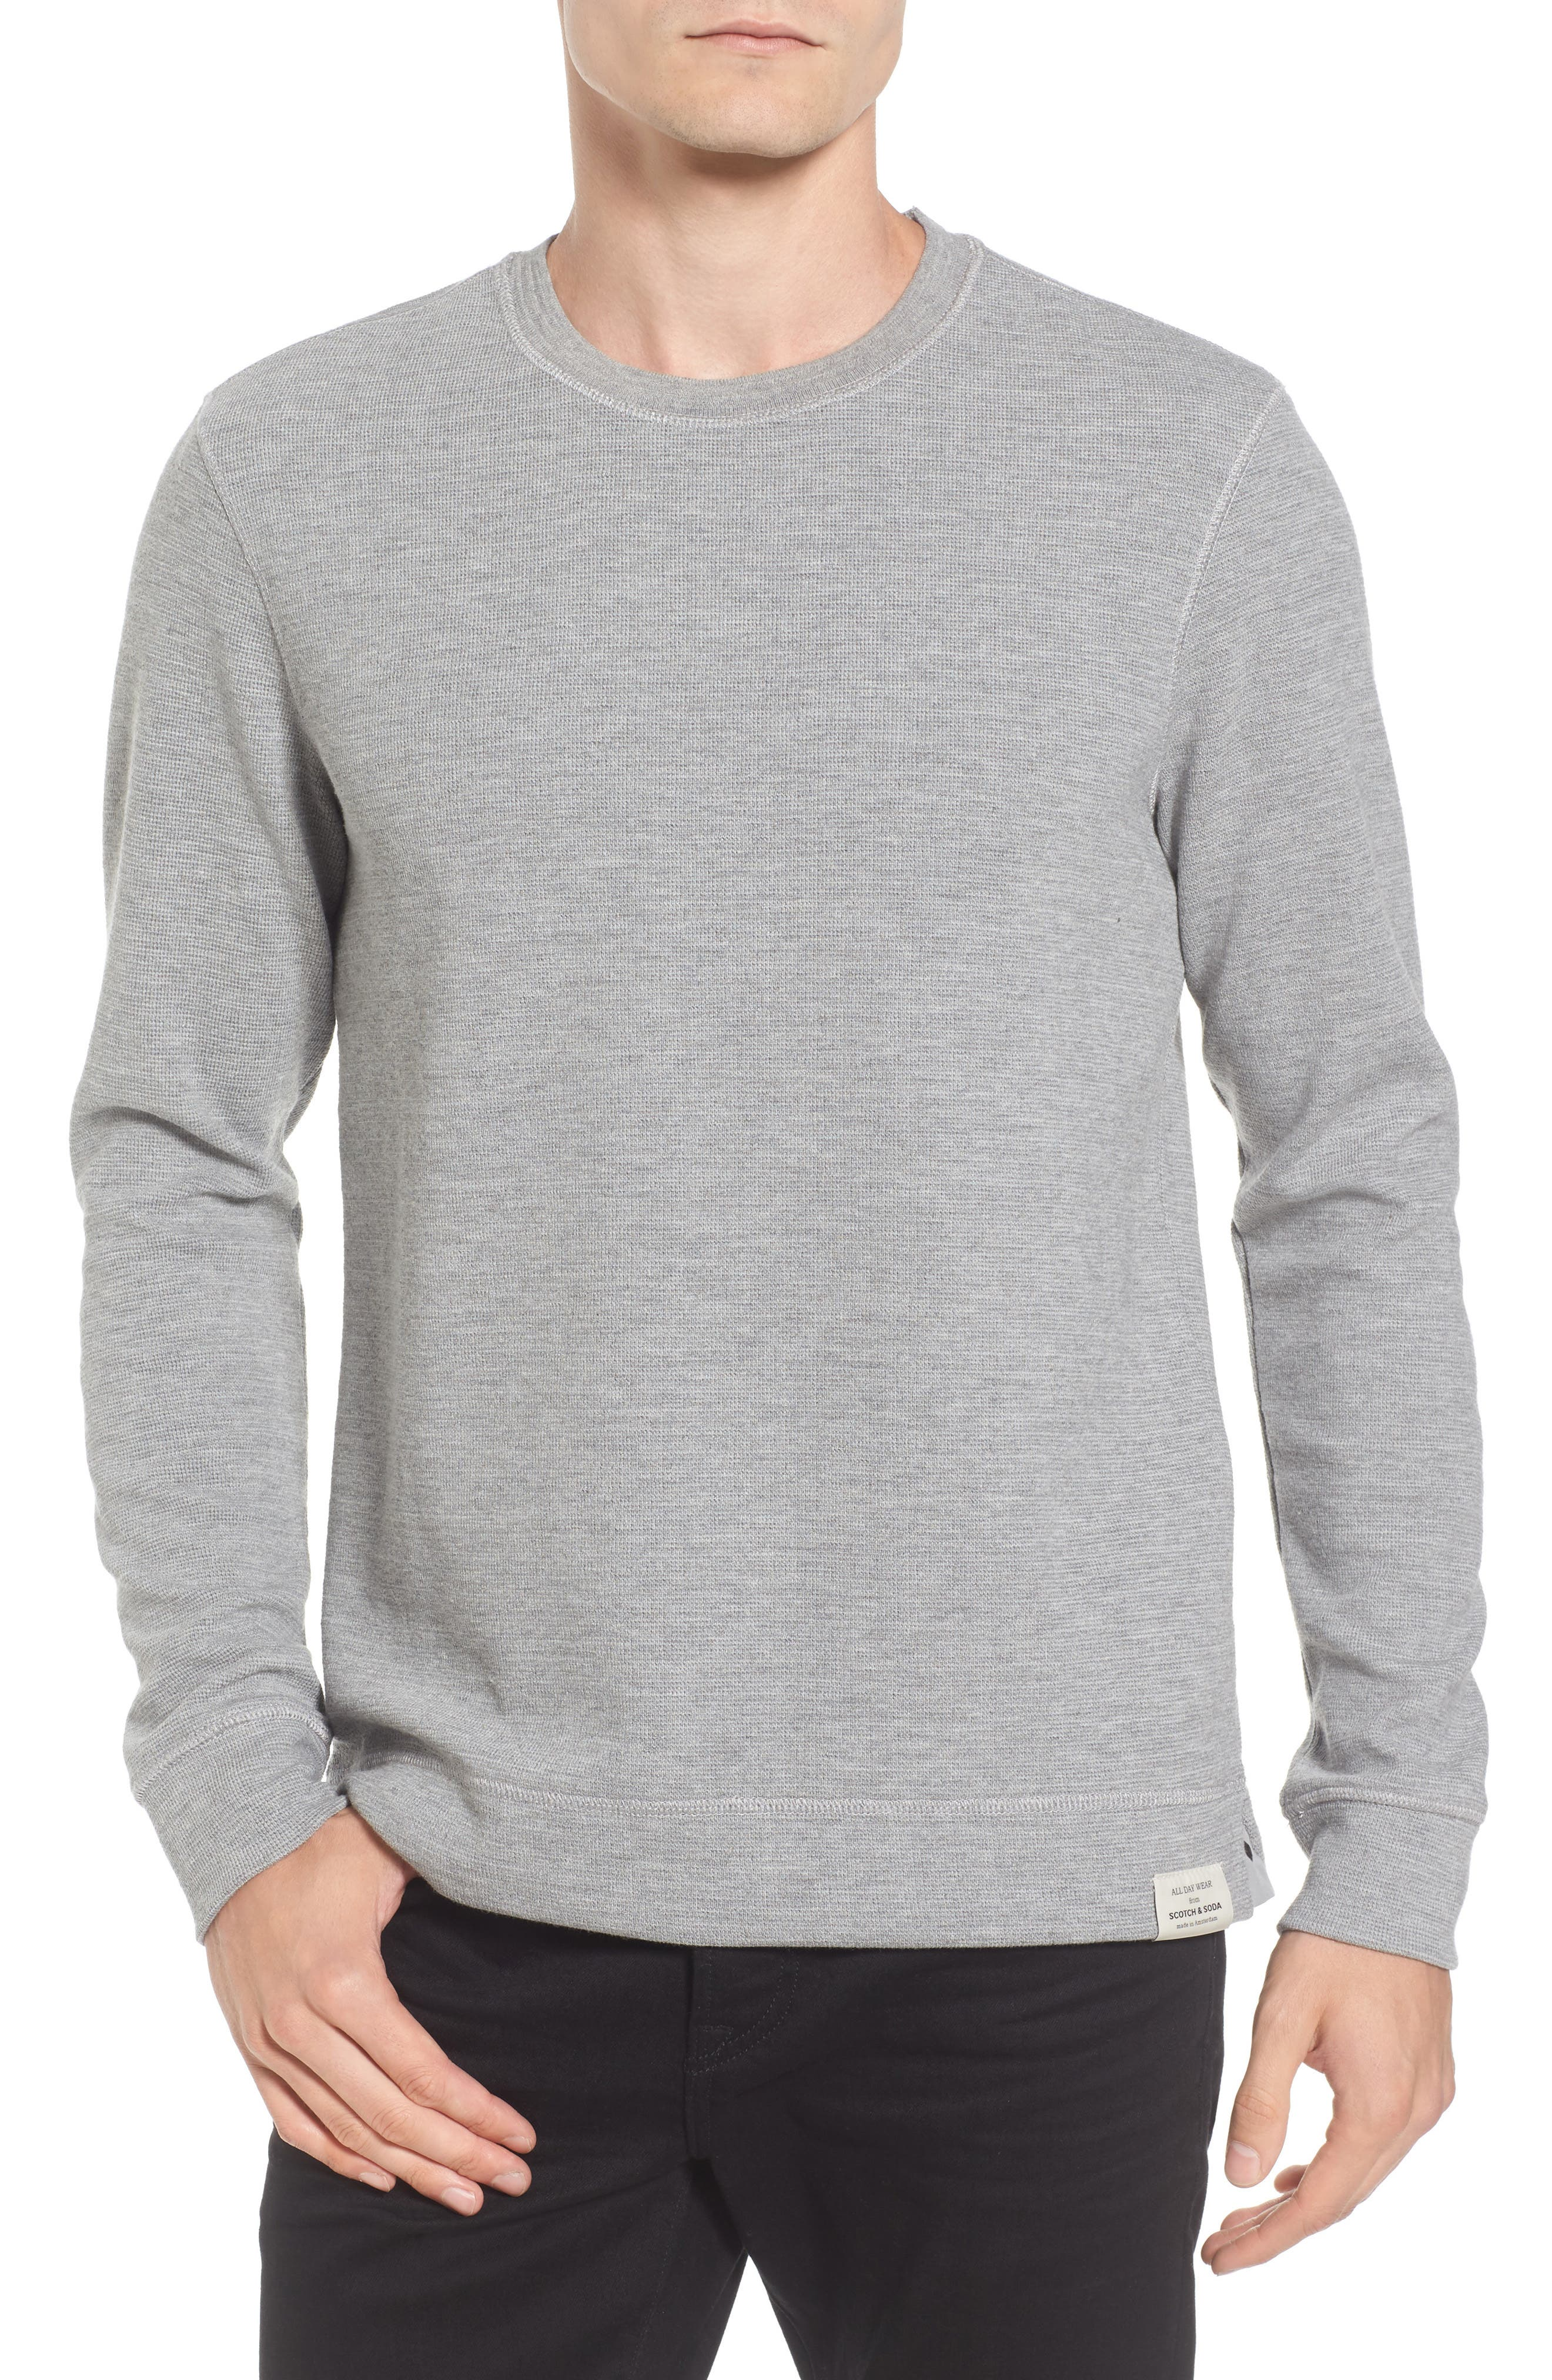 Scotch & Soda Classic Sweatshirt